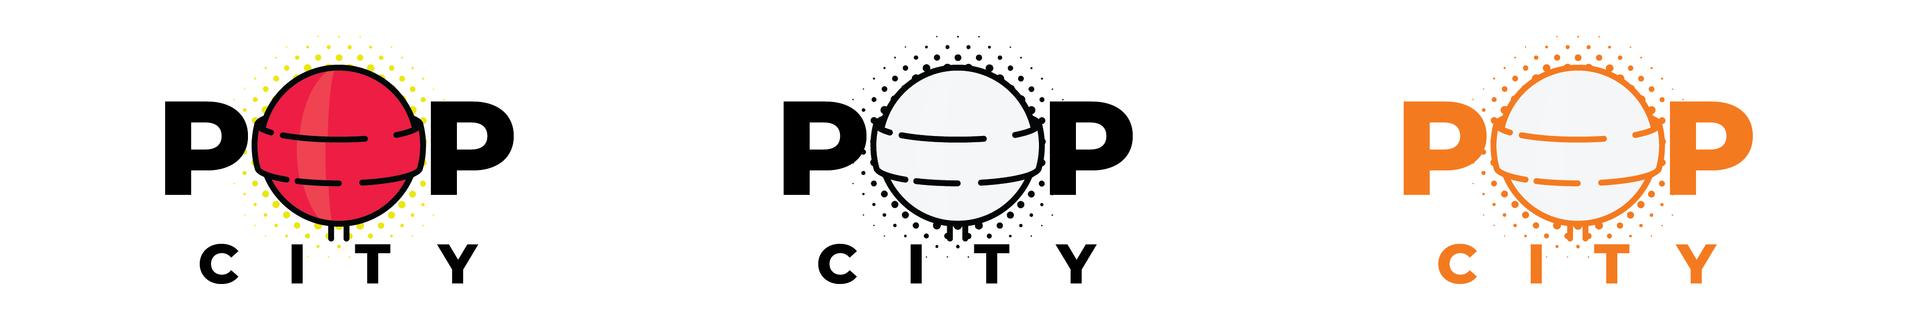 popcityartboard-28-2x_orig.png